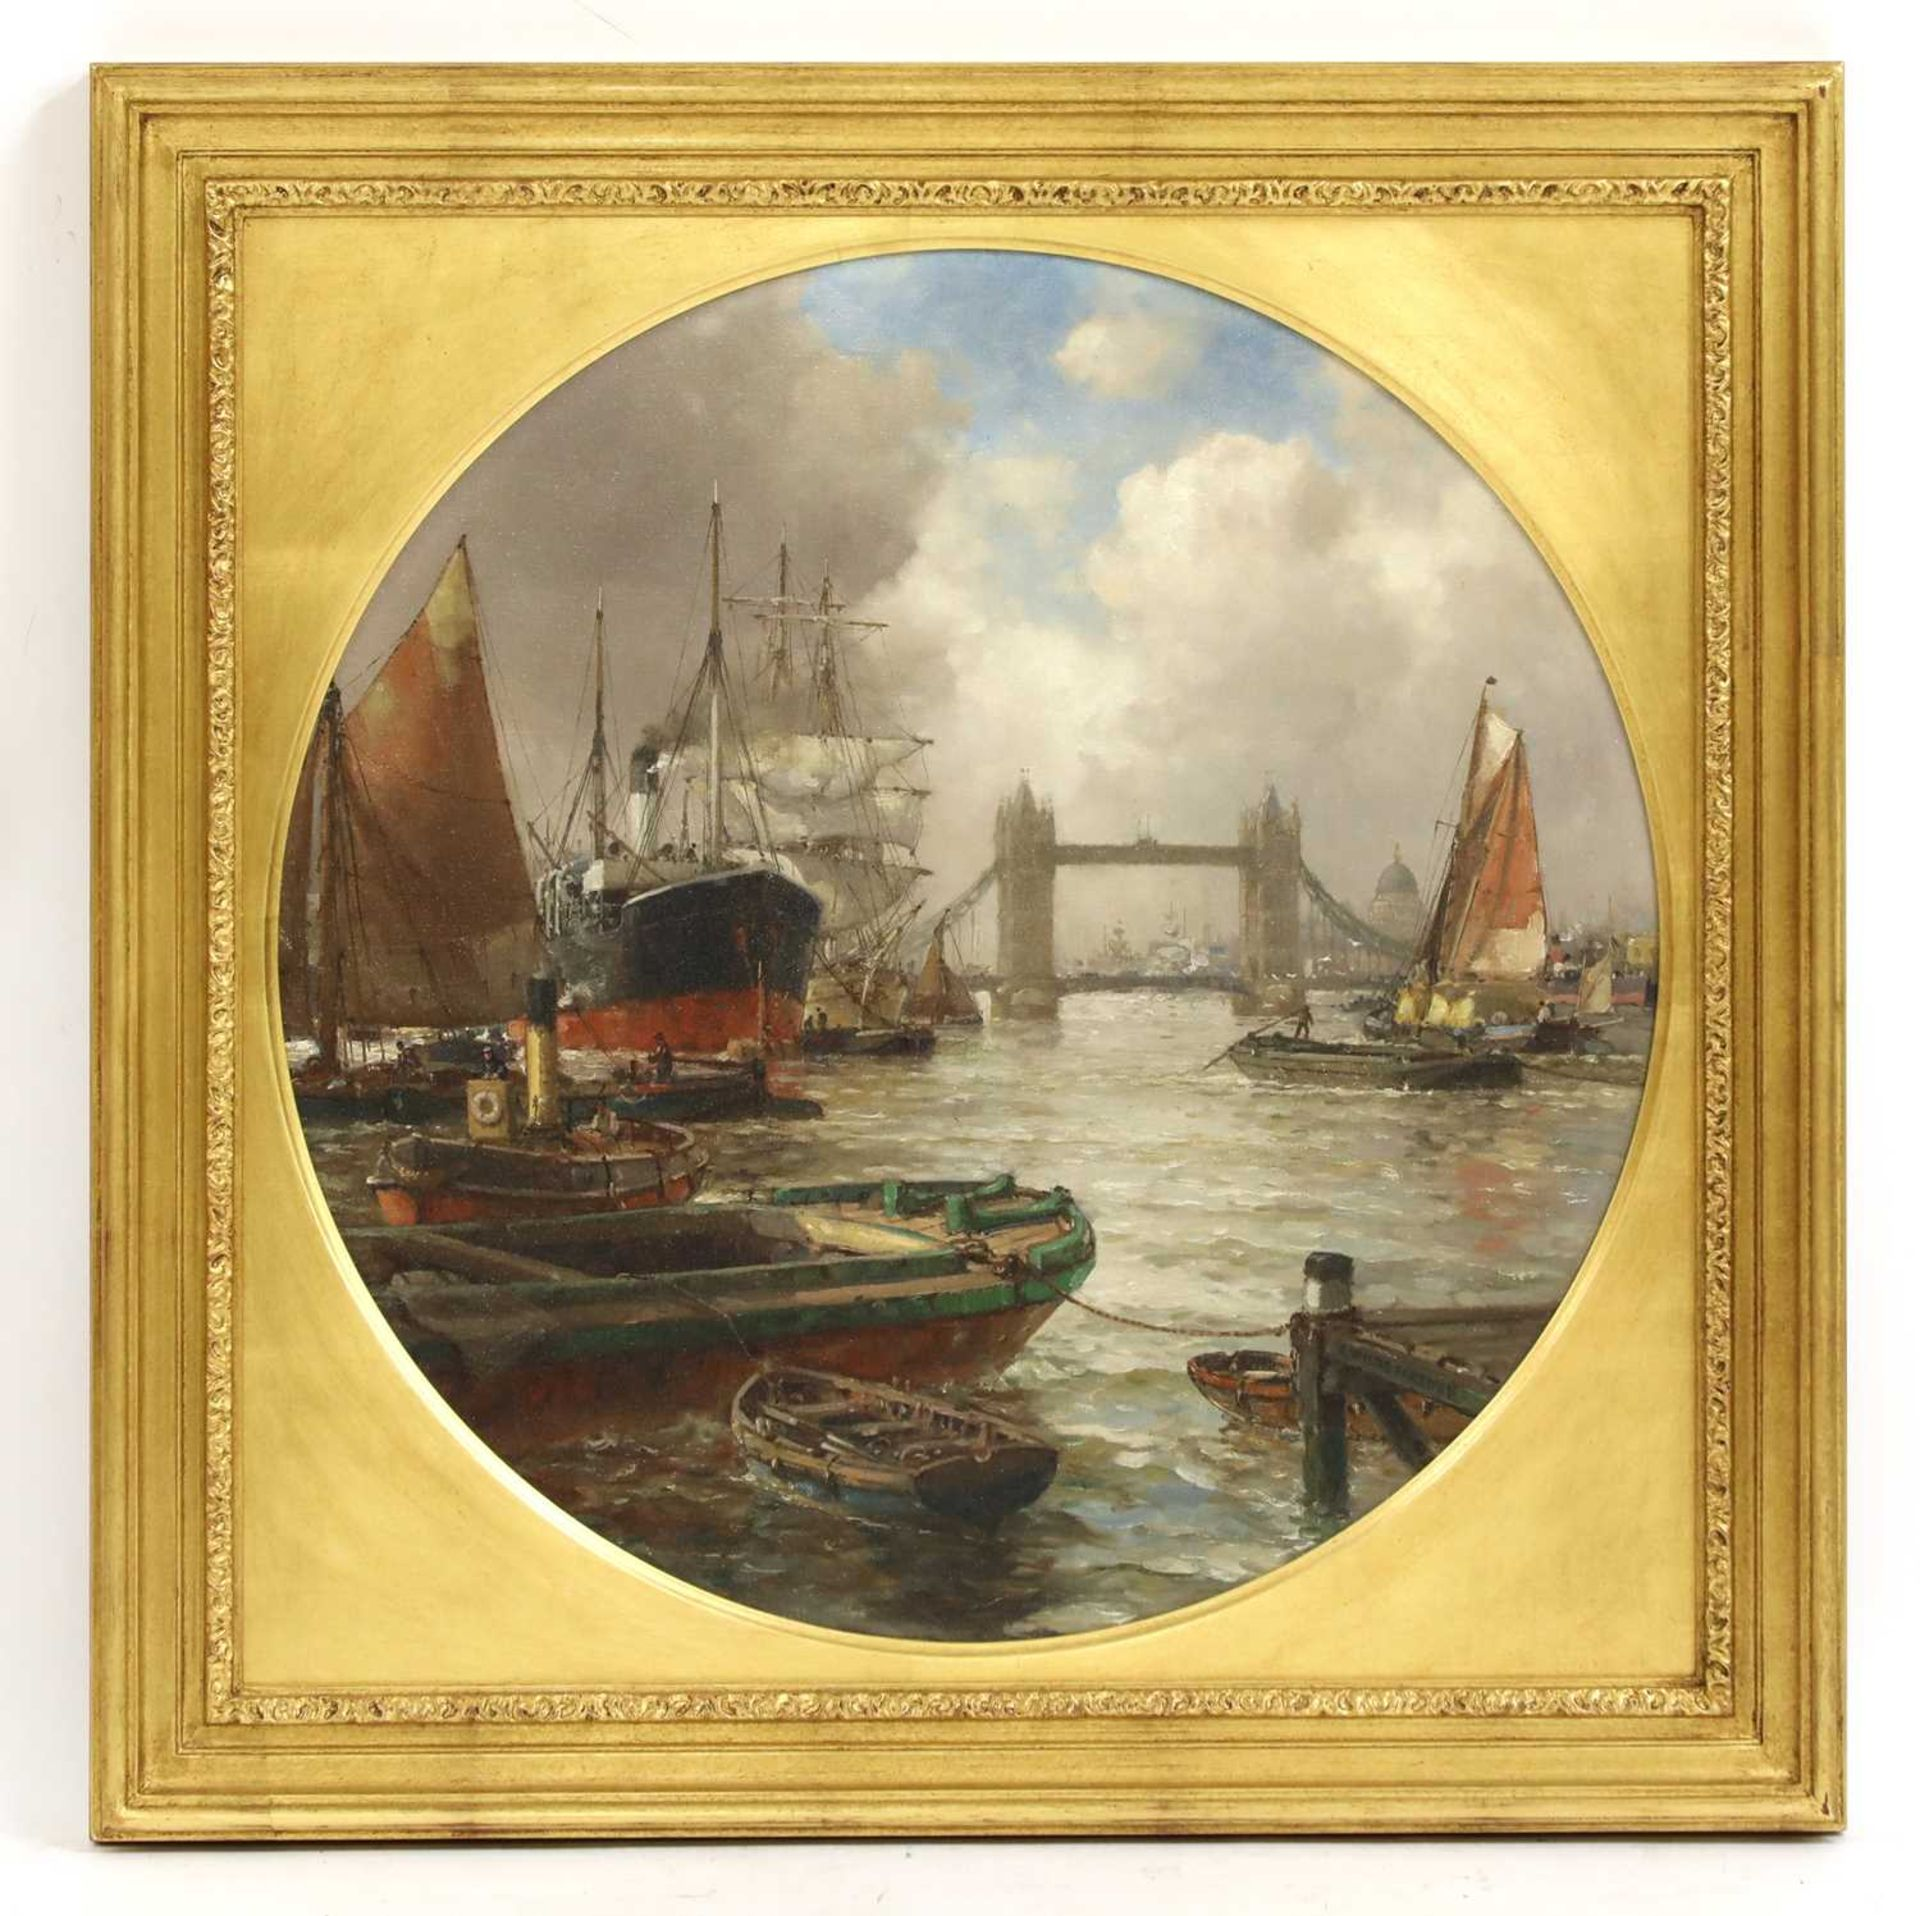 ARTHUR WILDE PARSONS (1854-1931)